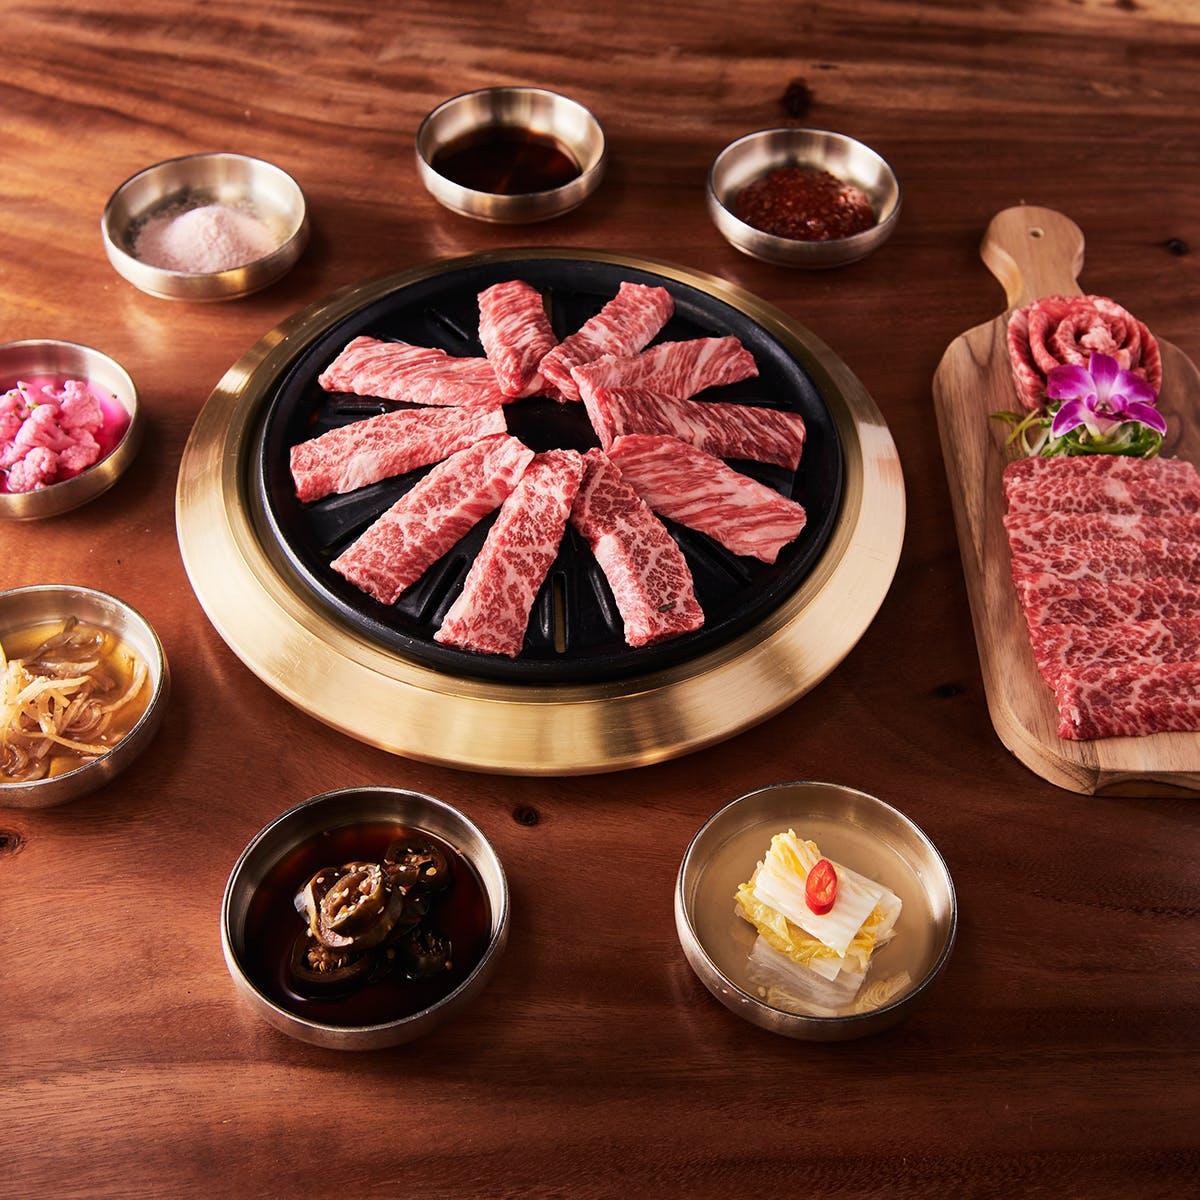 Samwon Garden Korean BBQ - Korean BBQ Short Rib Kit for 6-8